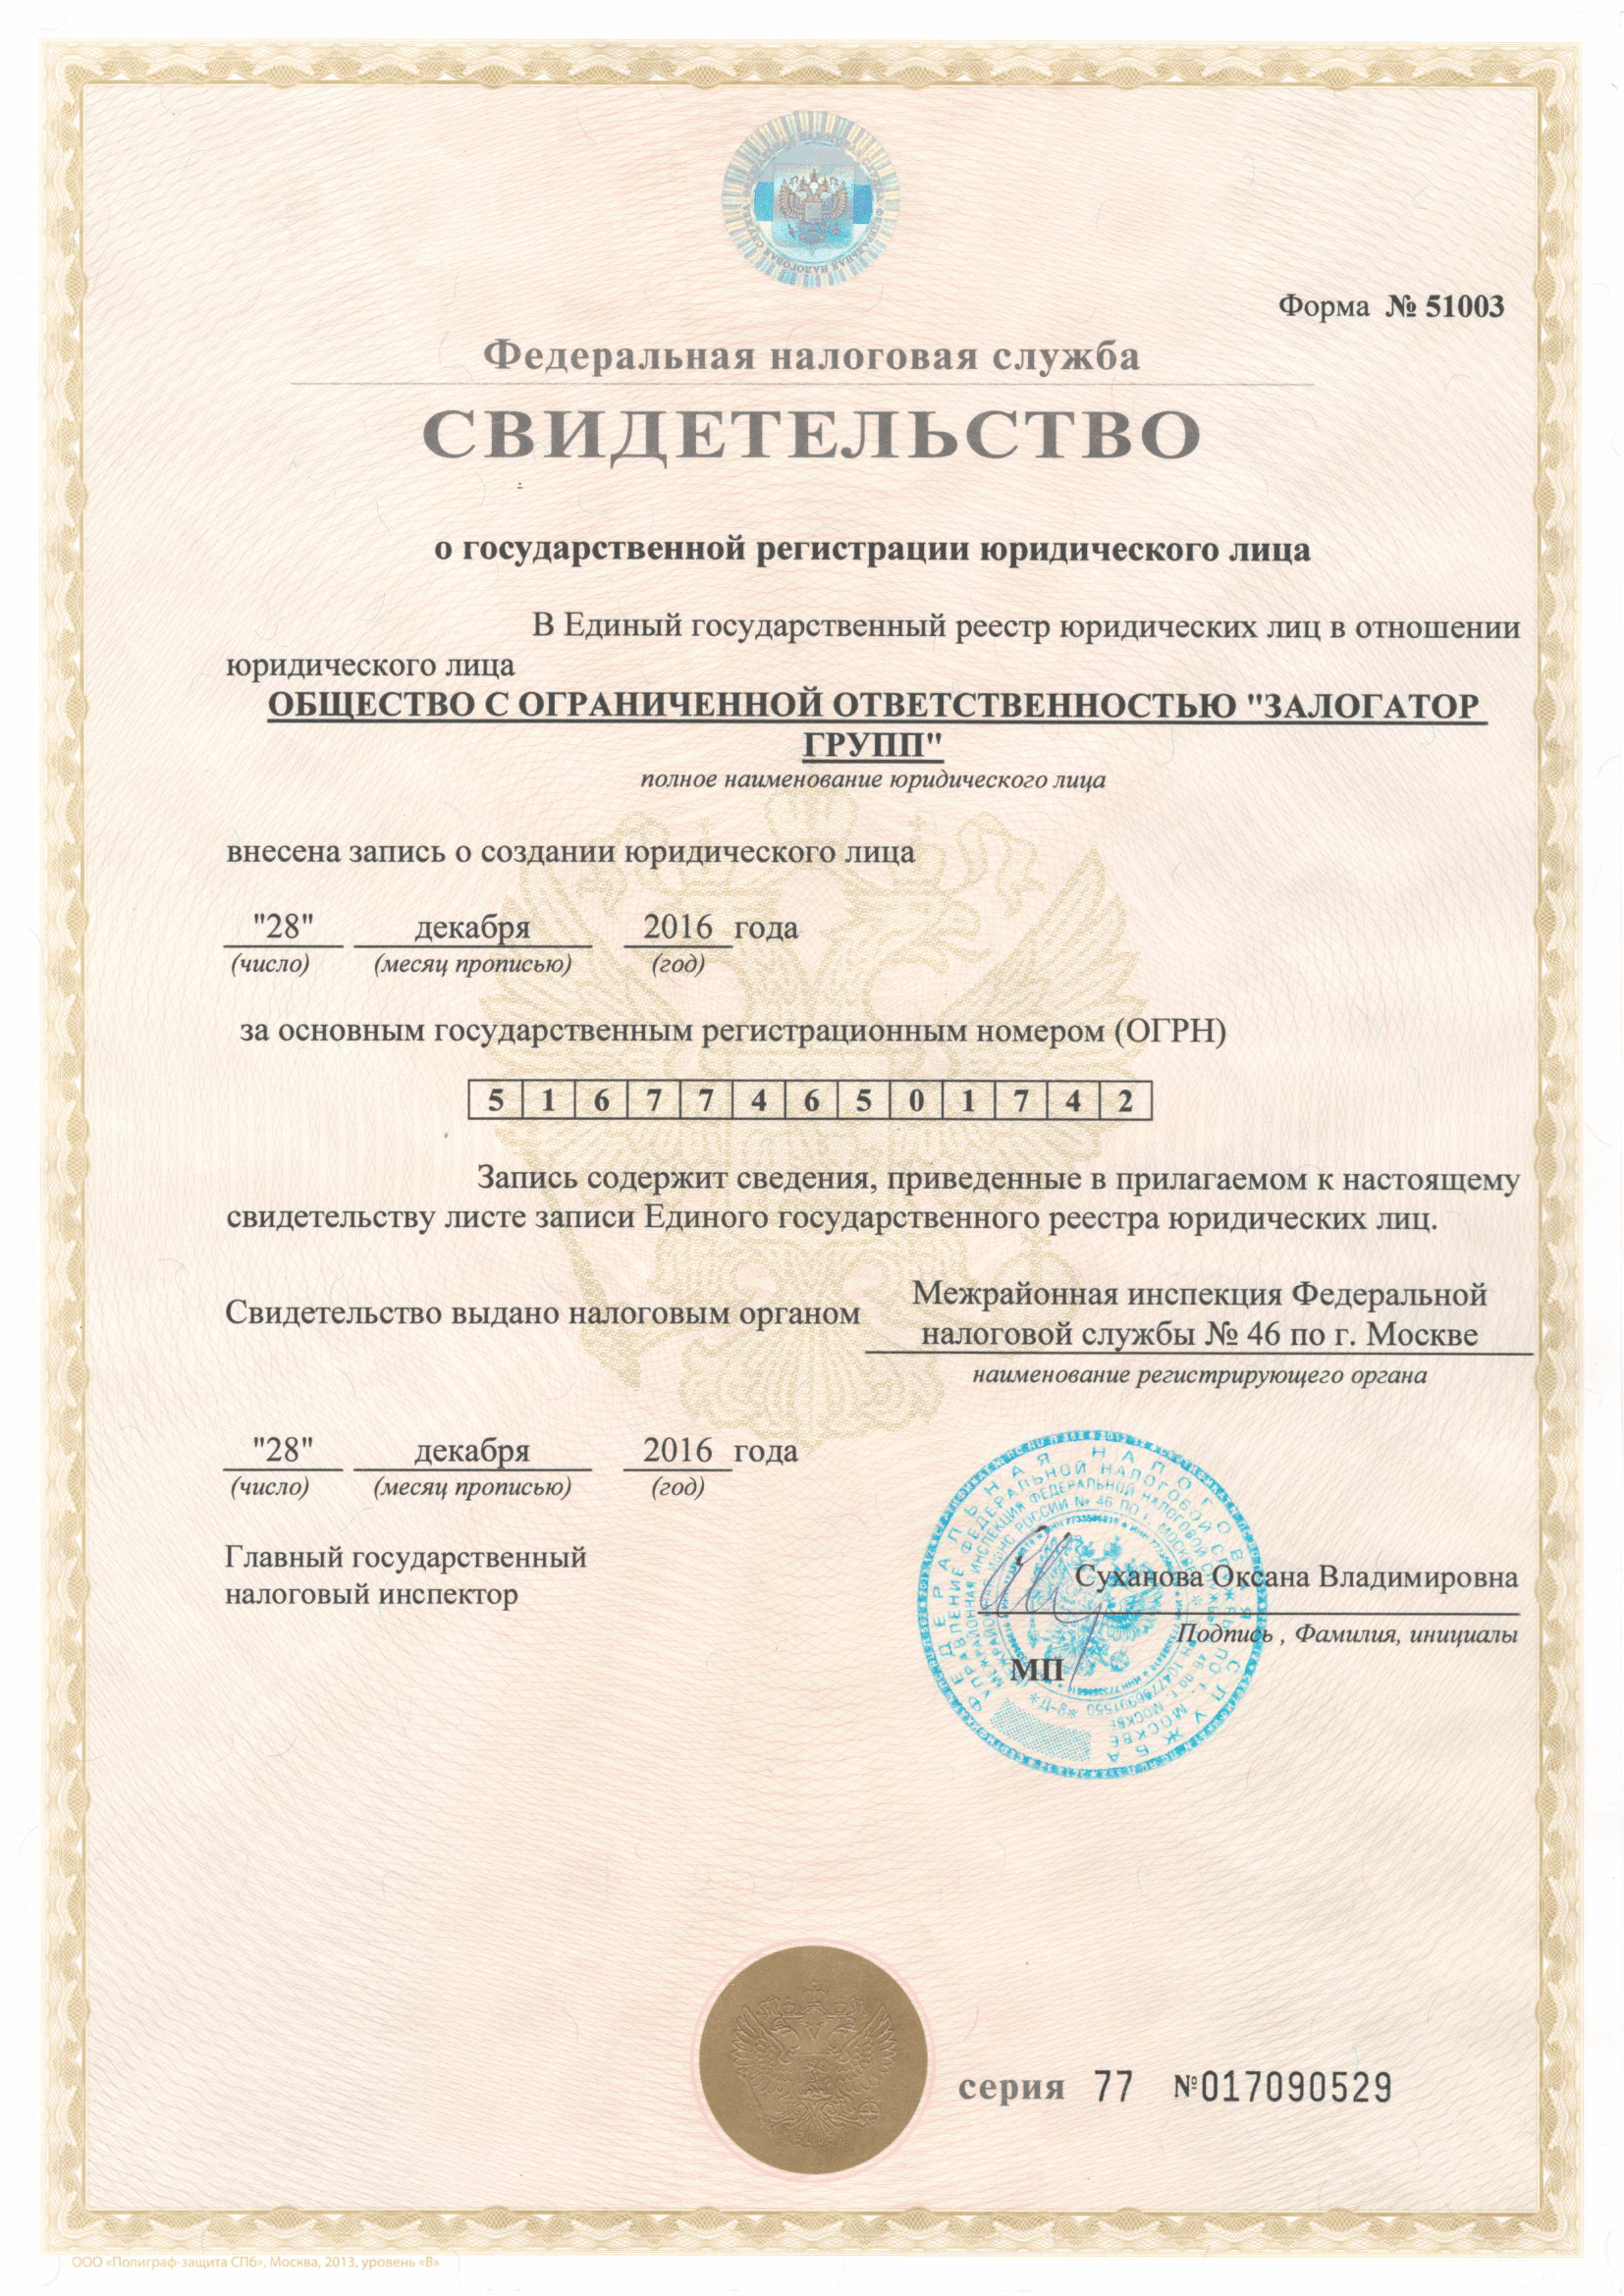 azanptsvzalogru - Деньги под залог ПТС